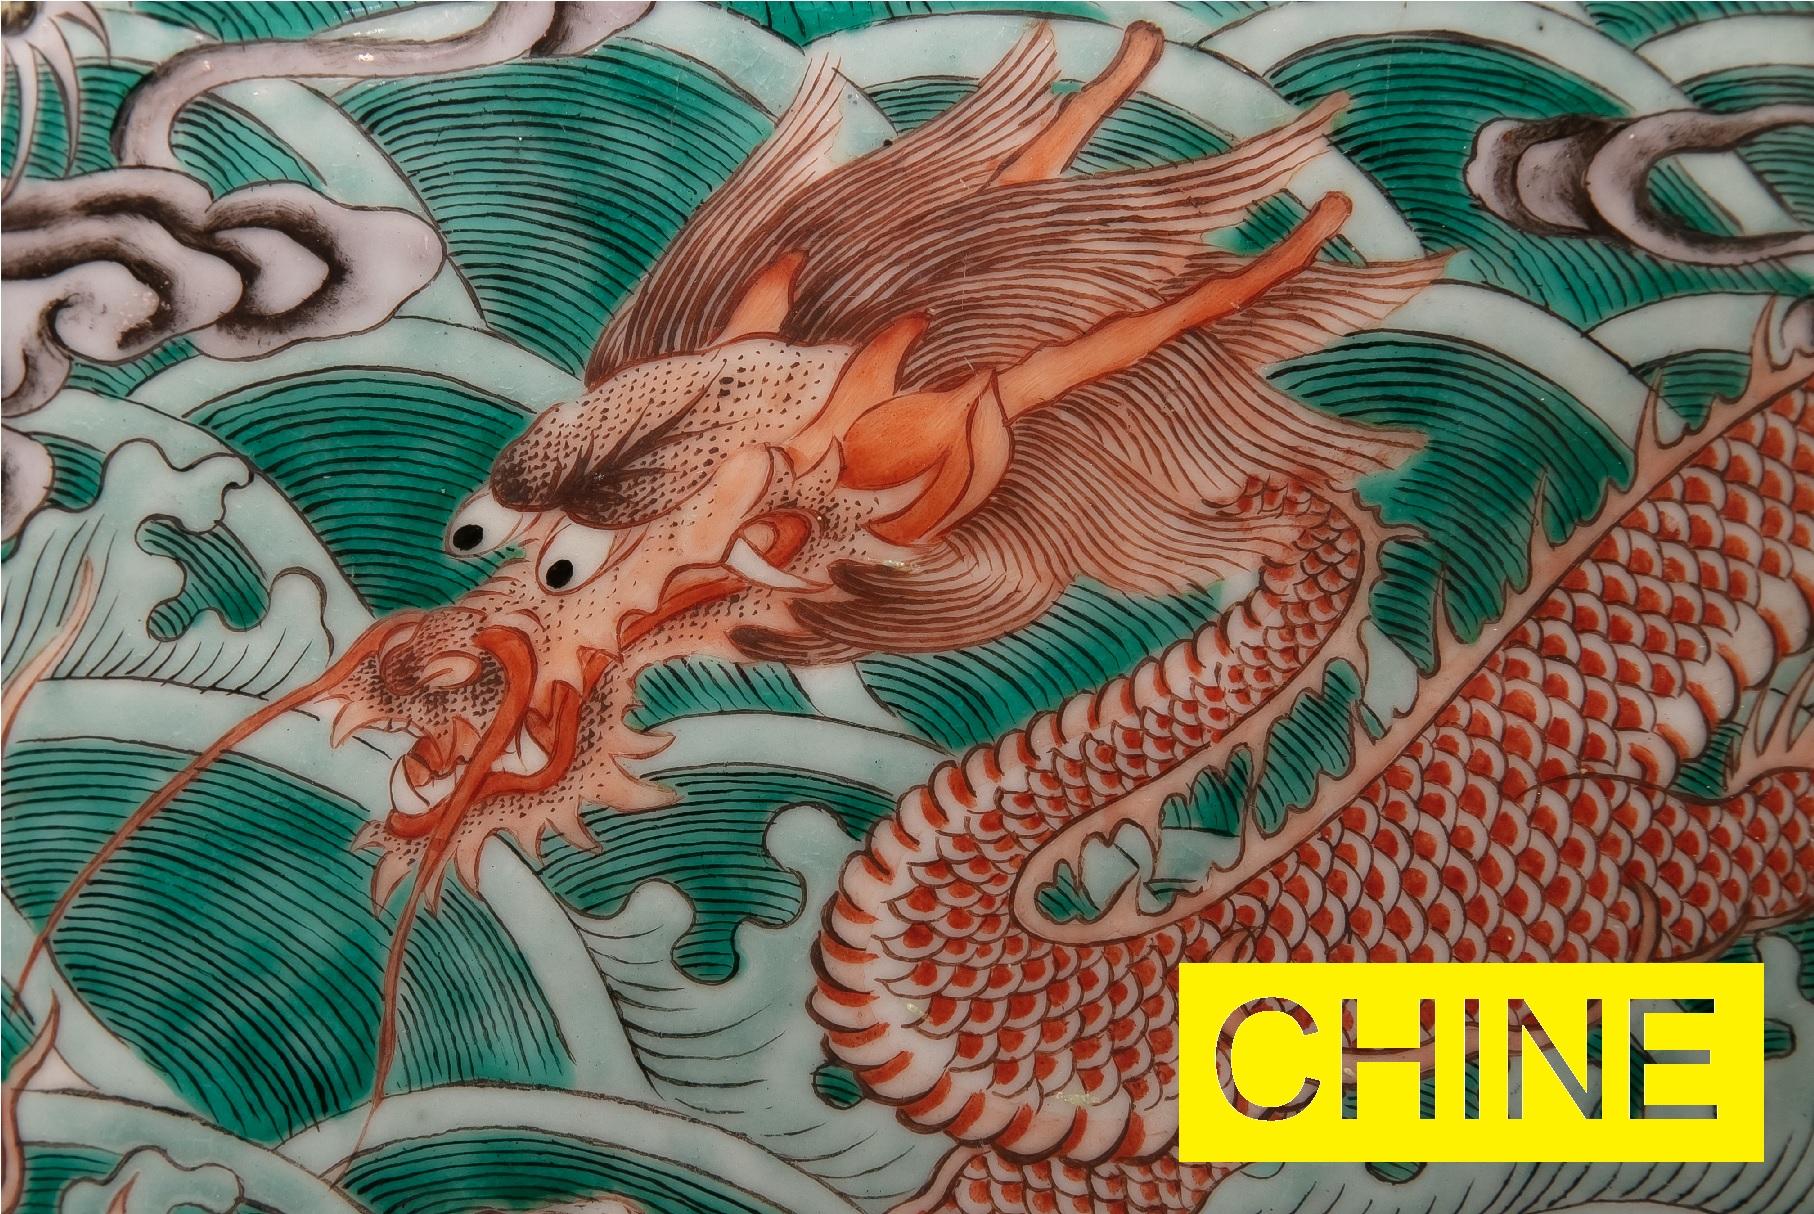 Vente CHINE  [HUIS CLOS] chez Boisgirard Antonini Paris : 172 lots